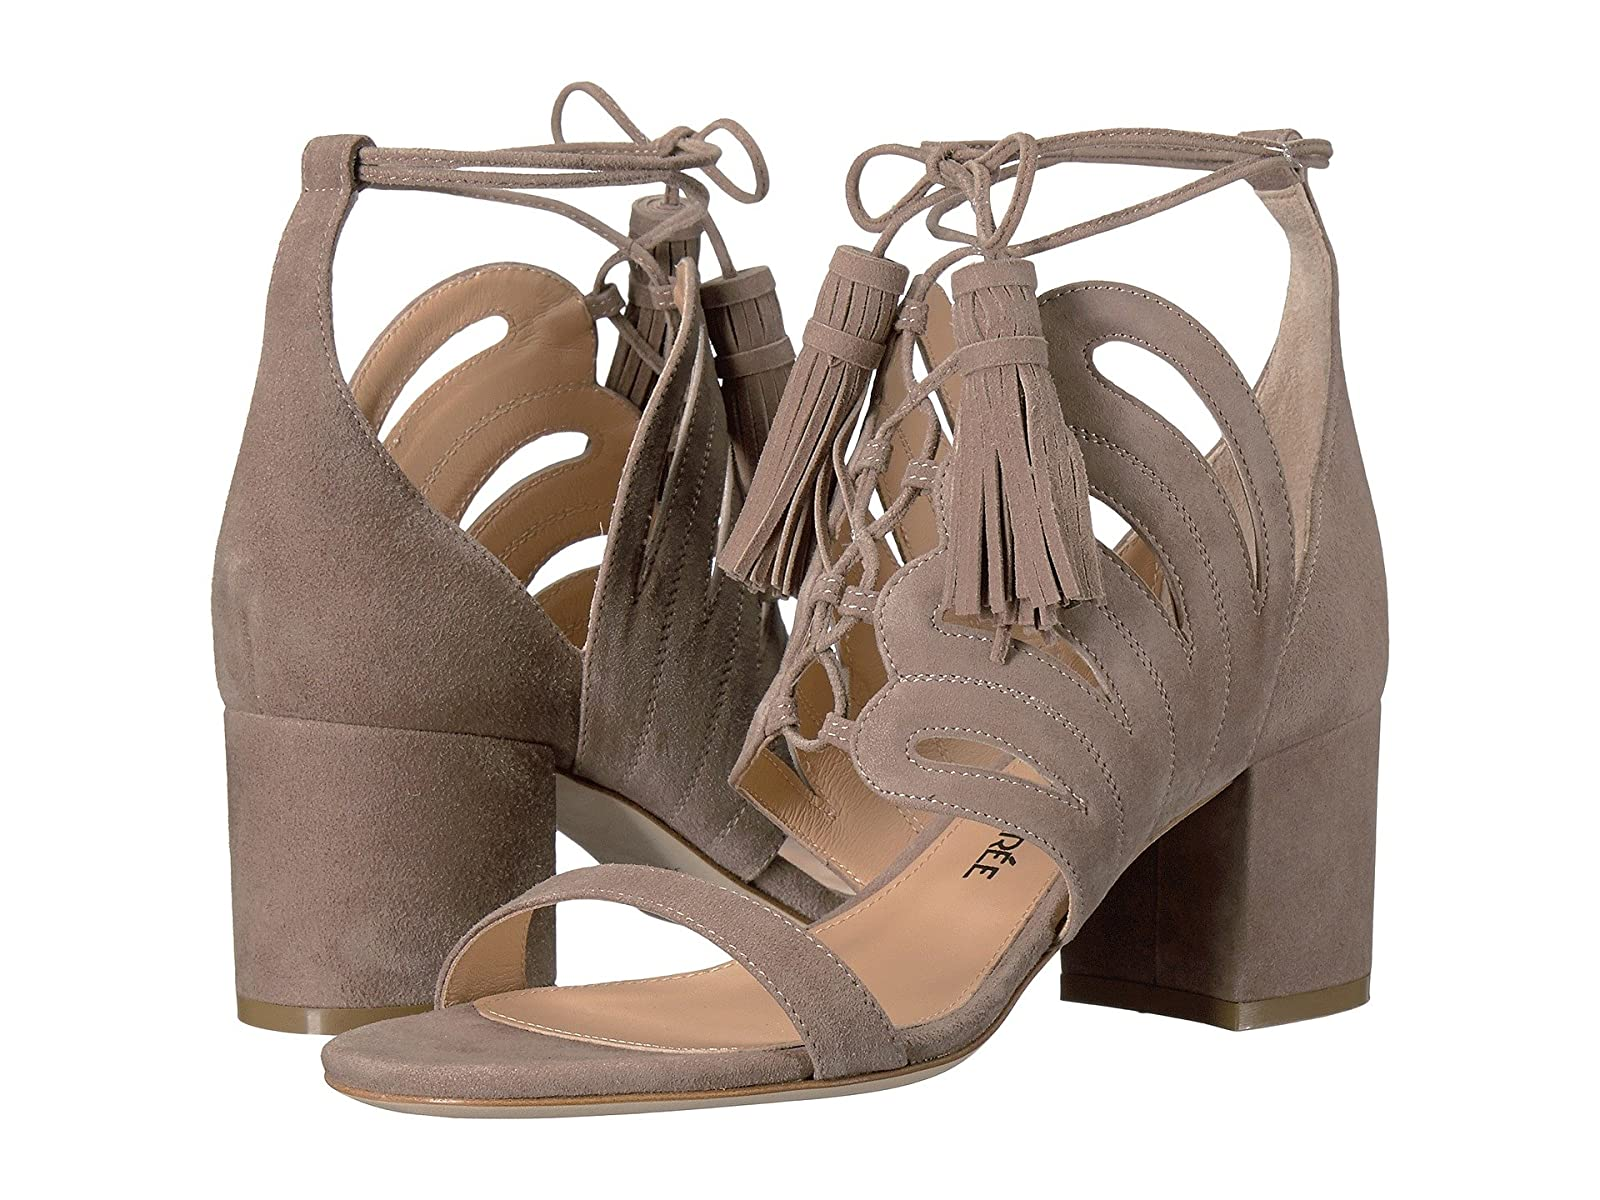 Racine Carrée SelmaCheap and distinctive eye-catching shoes